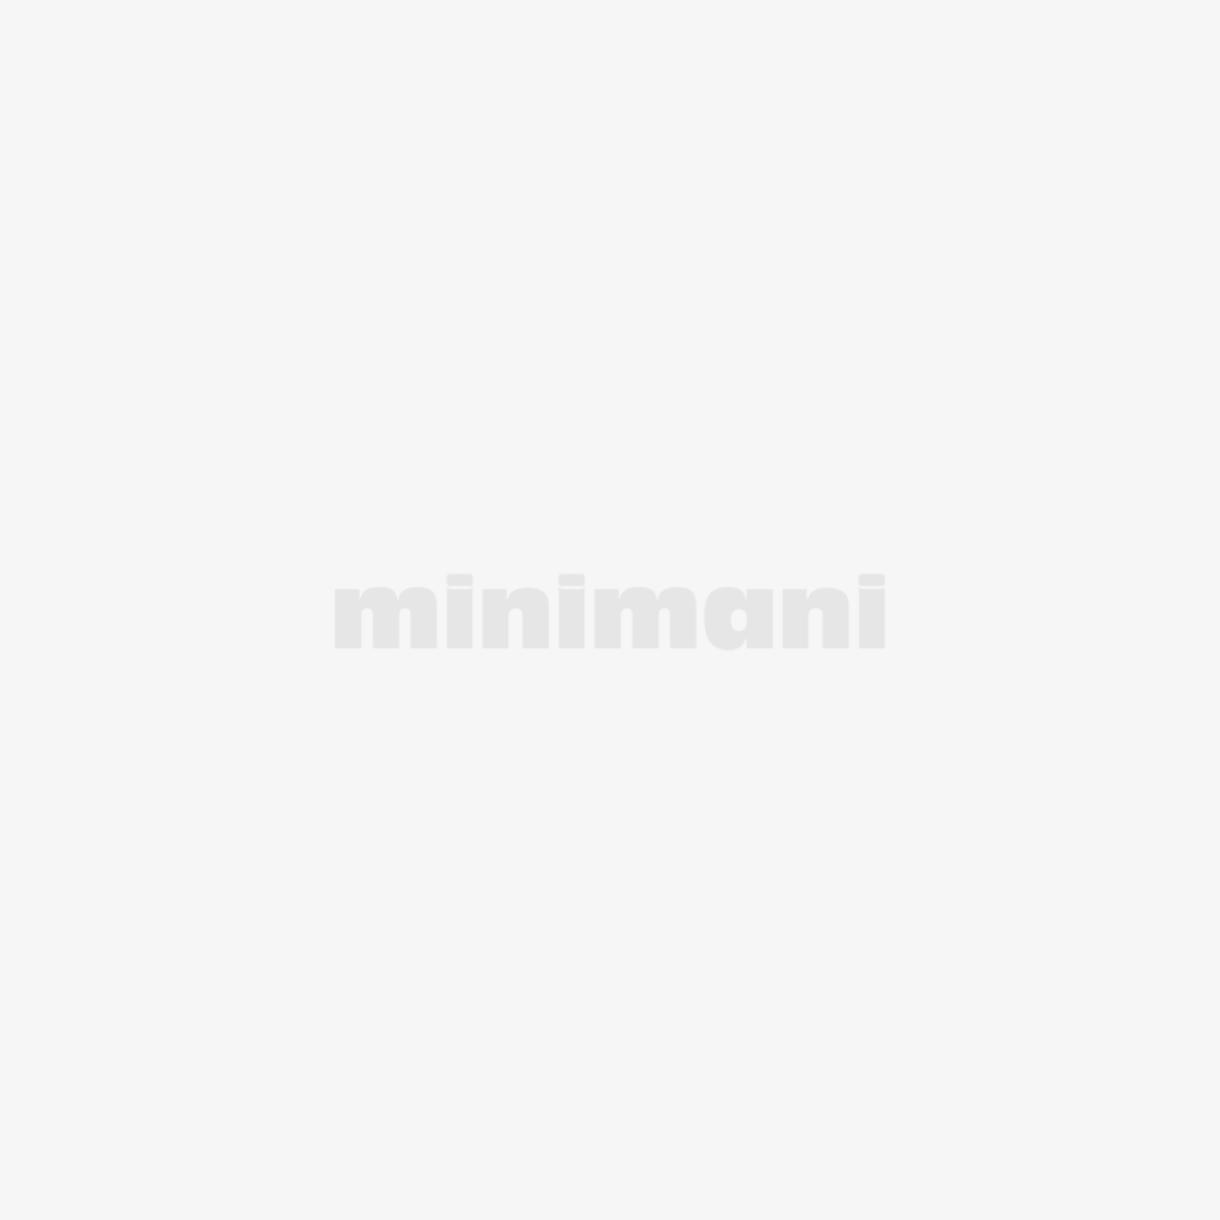 VALLILA VERHOKAPPA LINNEA 60X250 CM pink